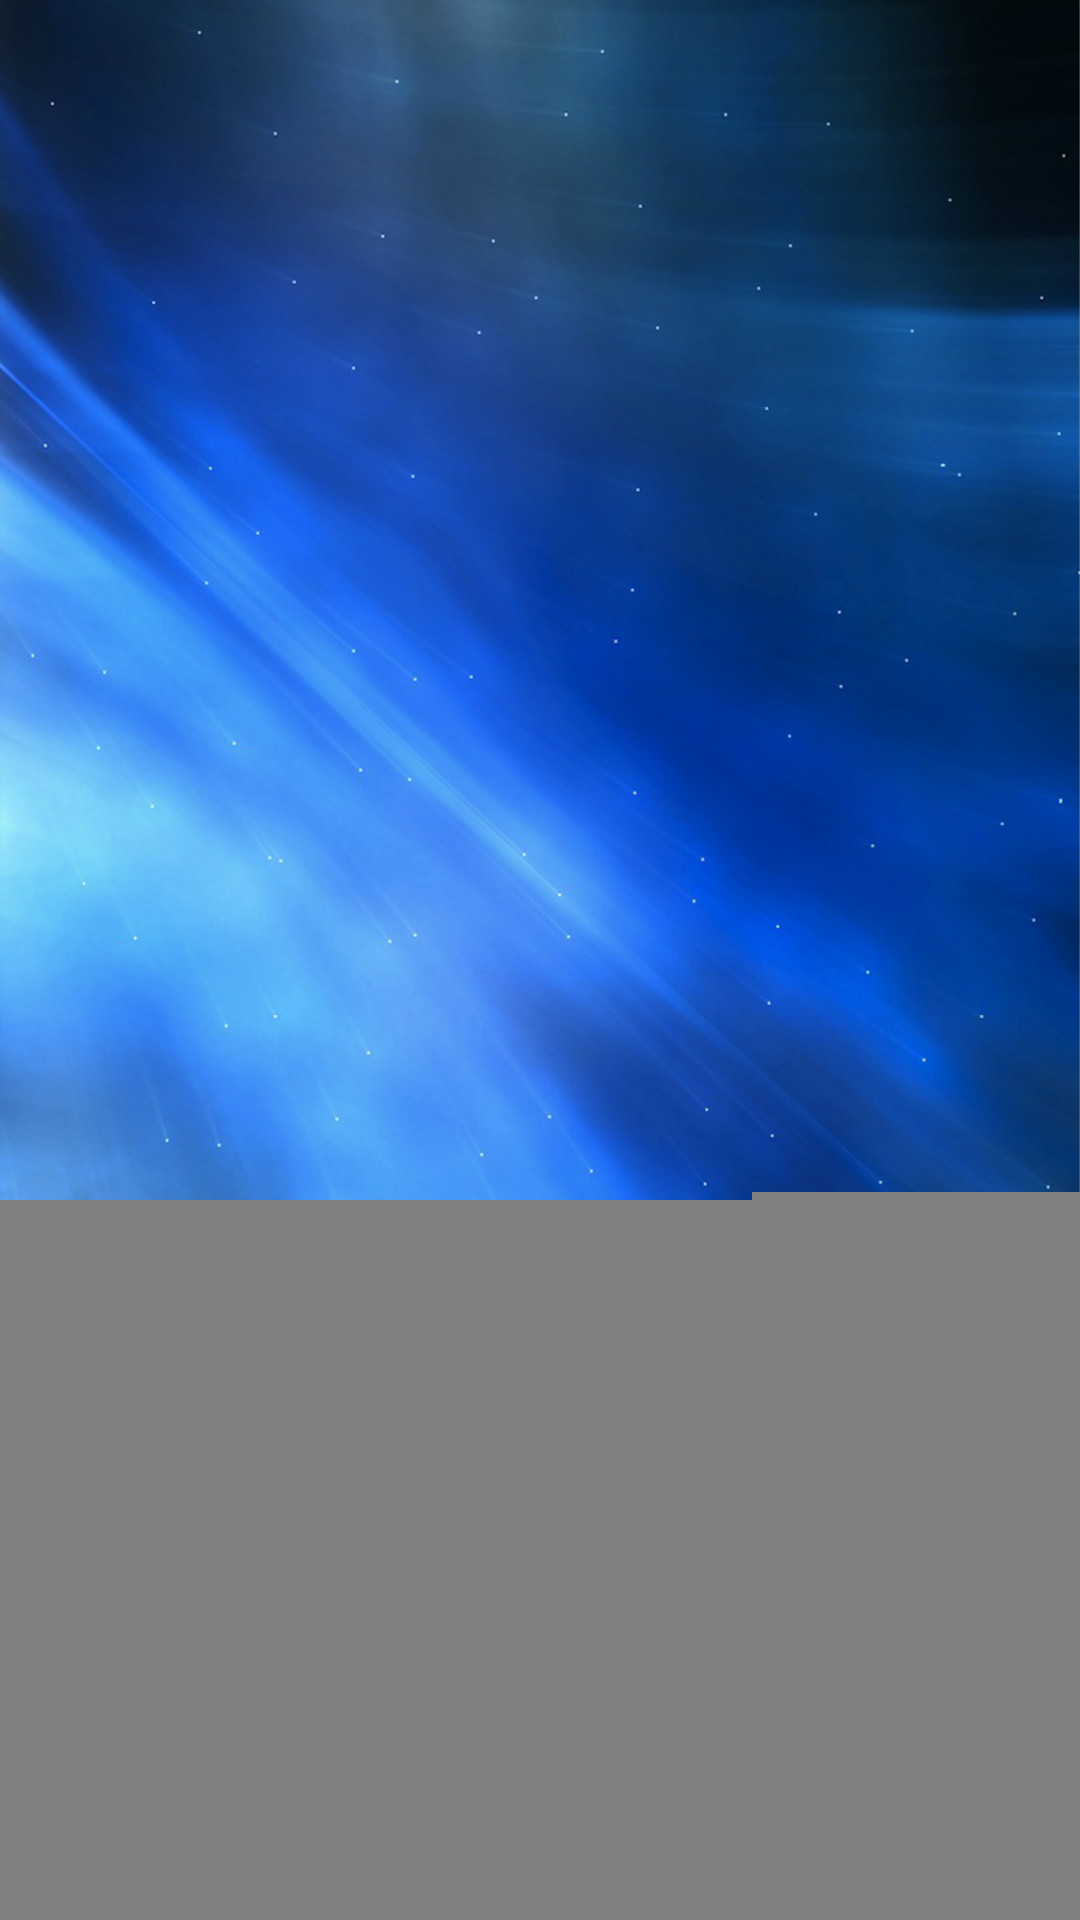 Abstract Blue Smoke Light Swirl Background iPhone 8 wallpaper